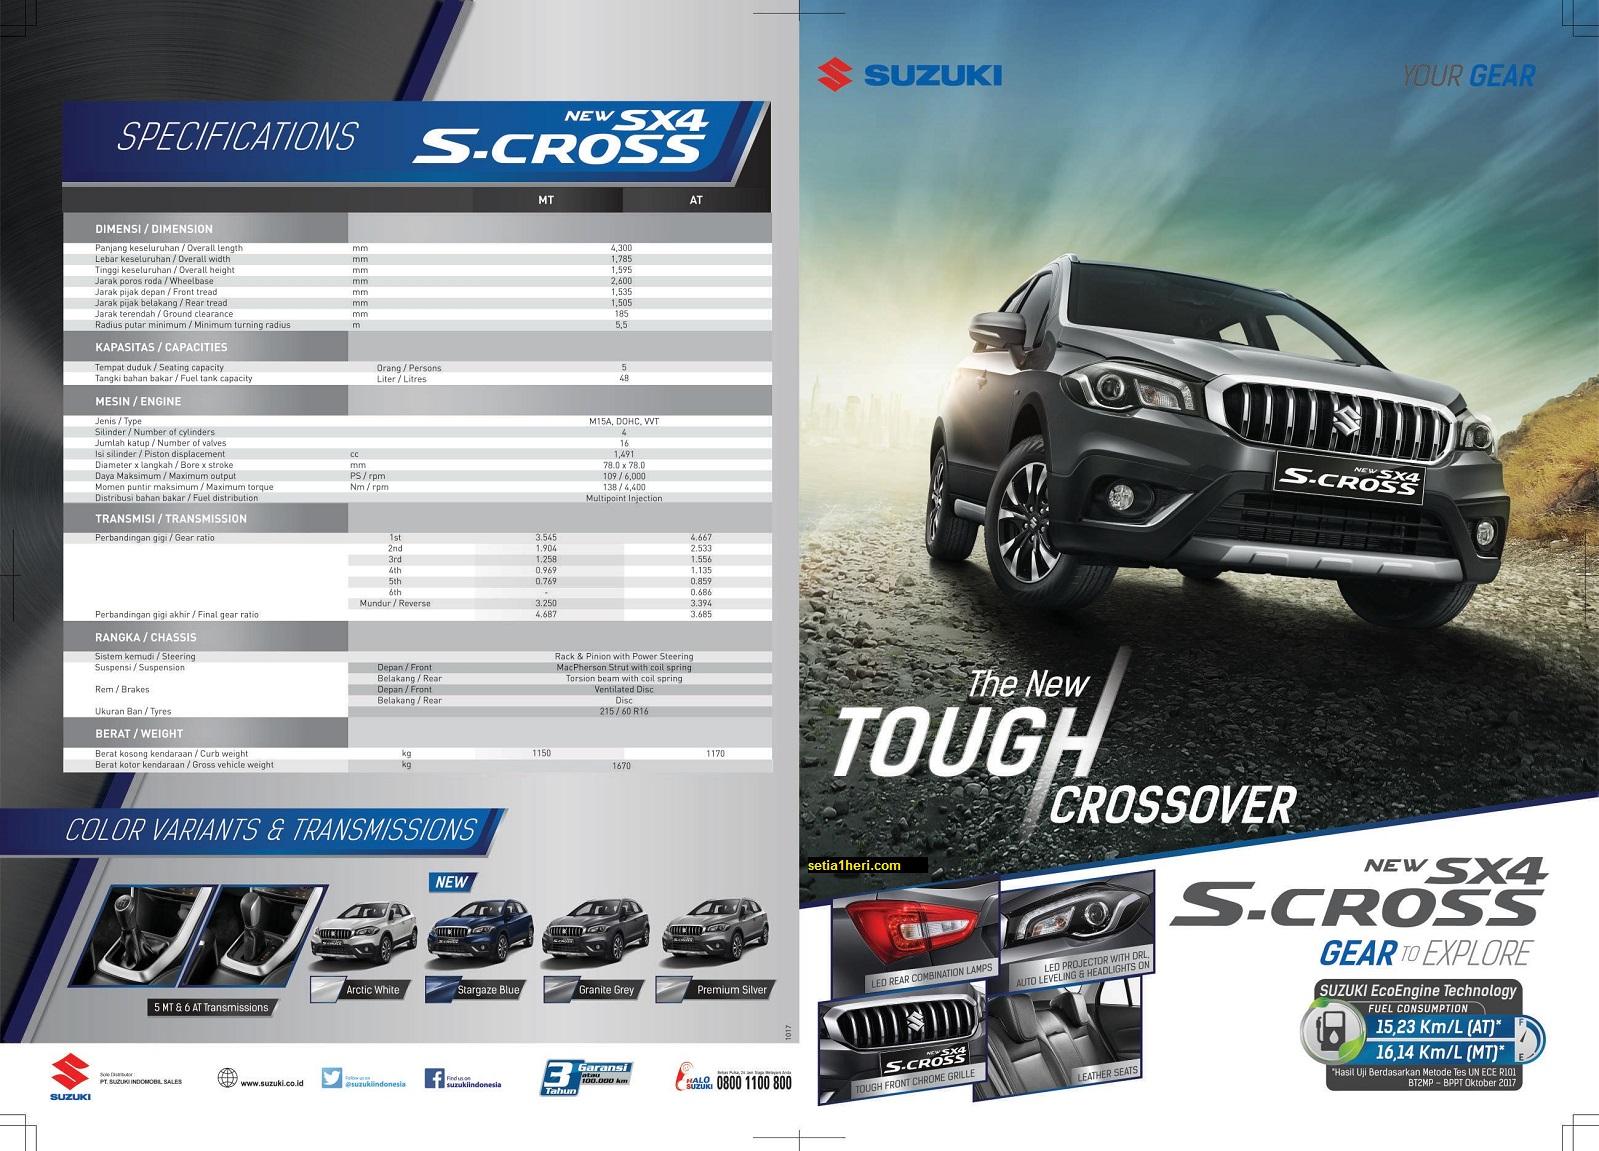 brosur Spesifikasi dan harga mobil Suzuki New SX4 S Cross